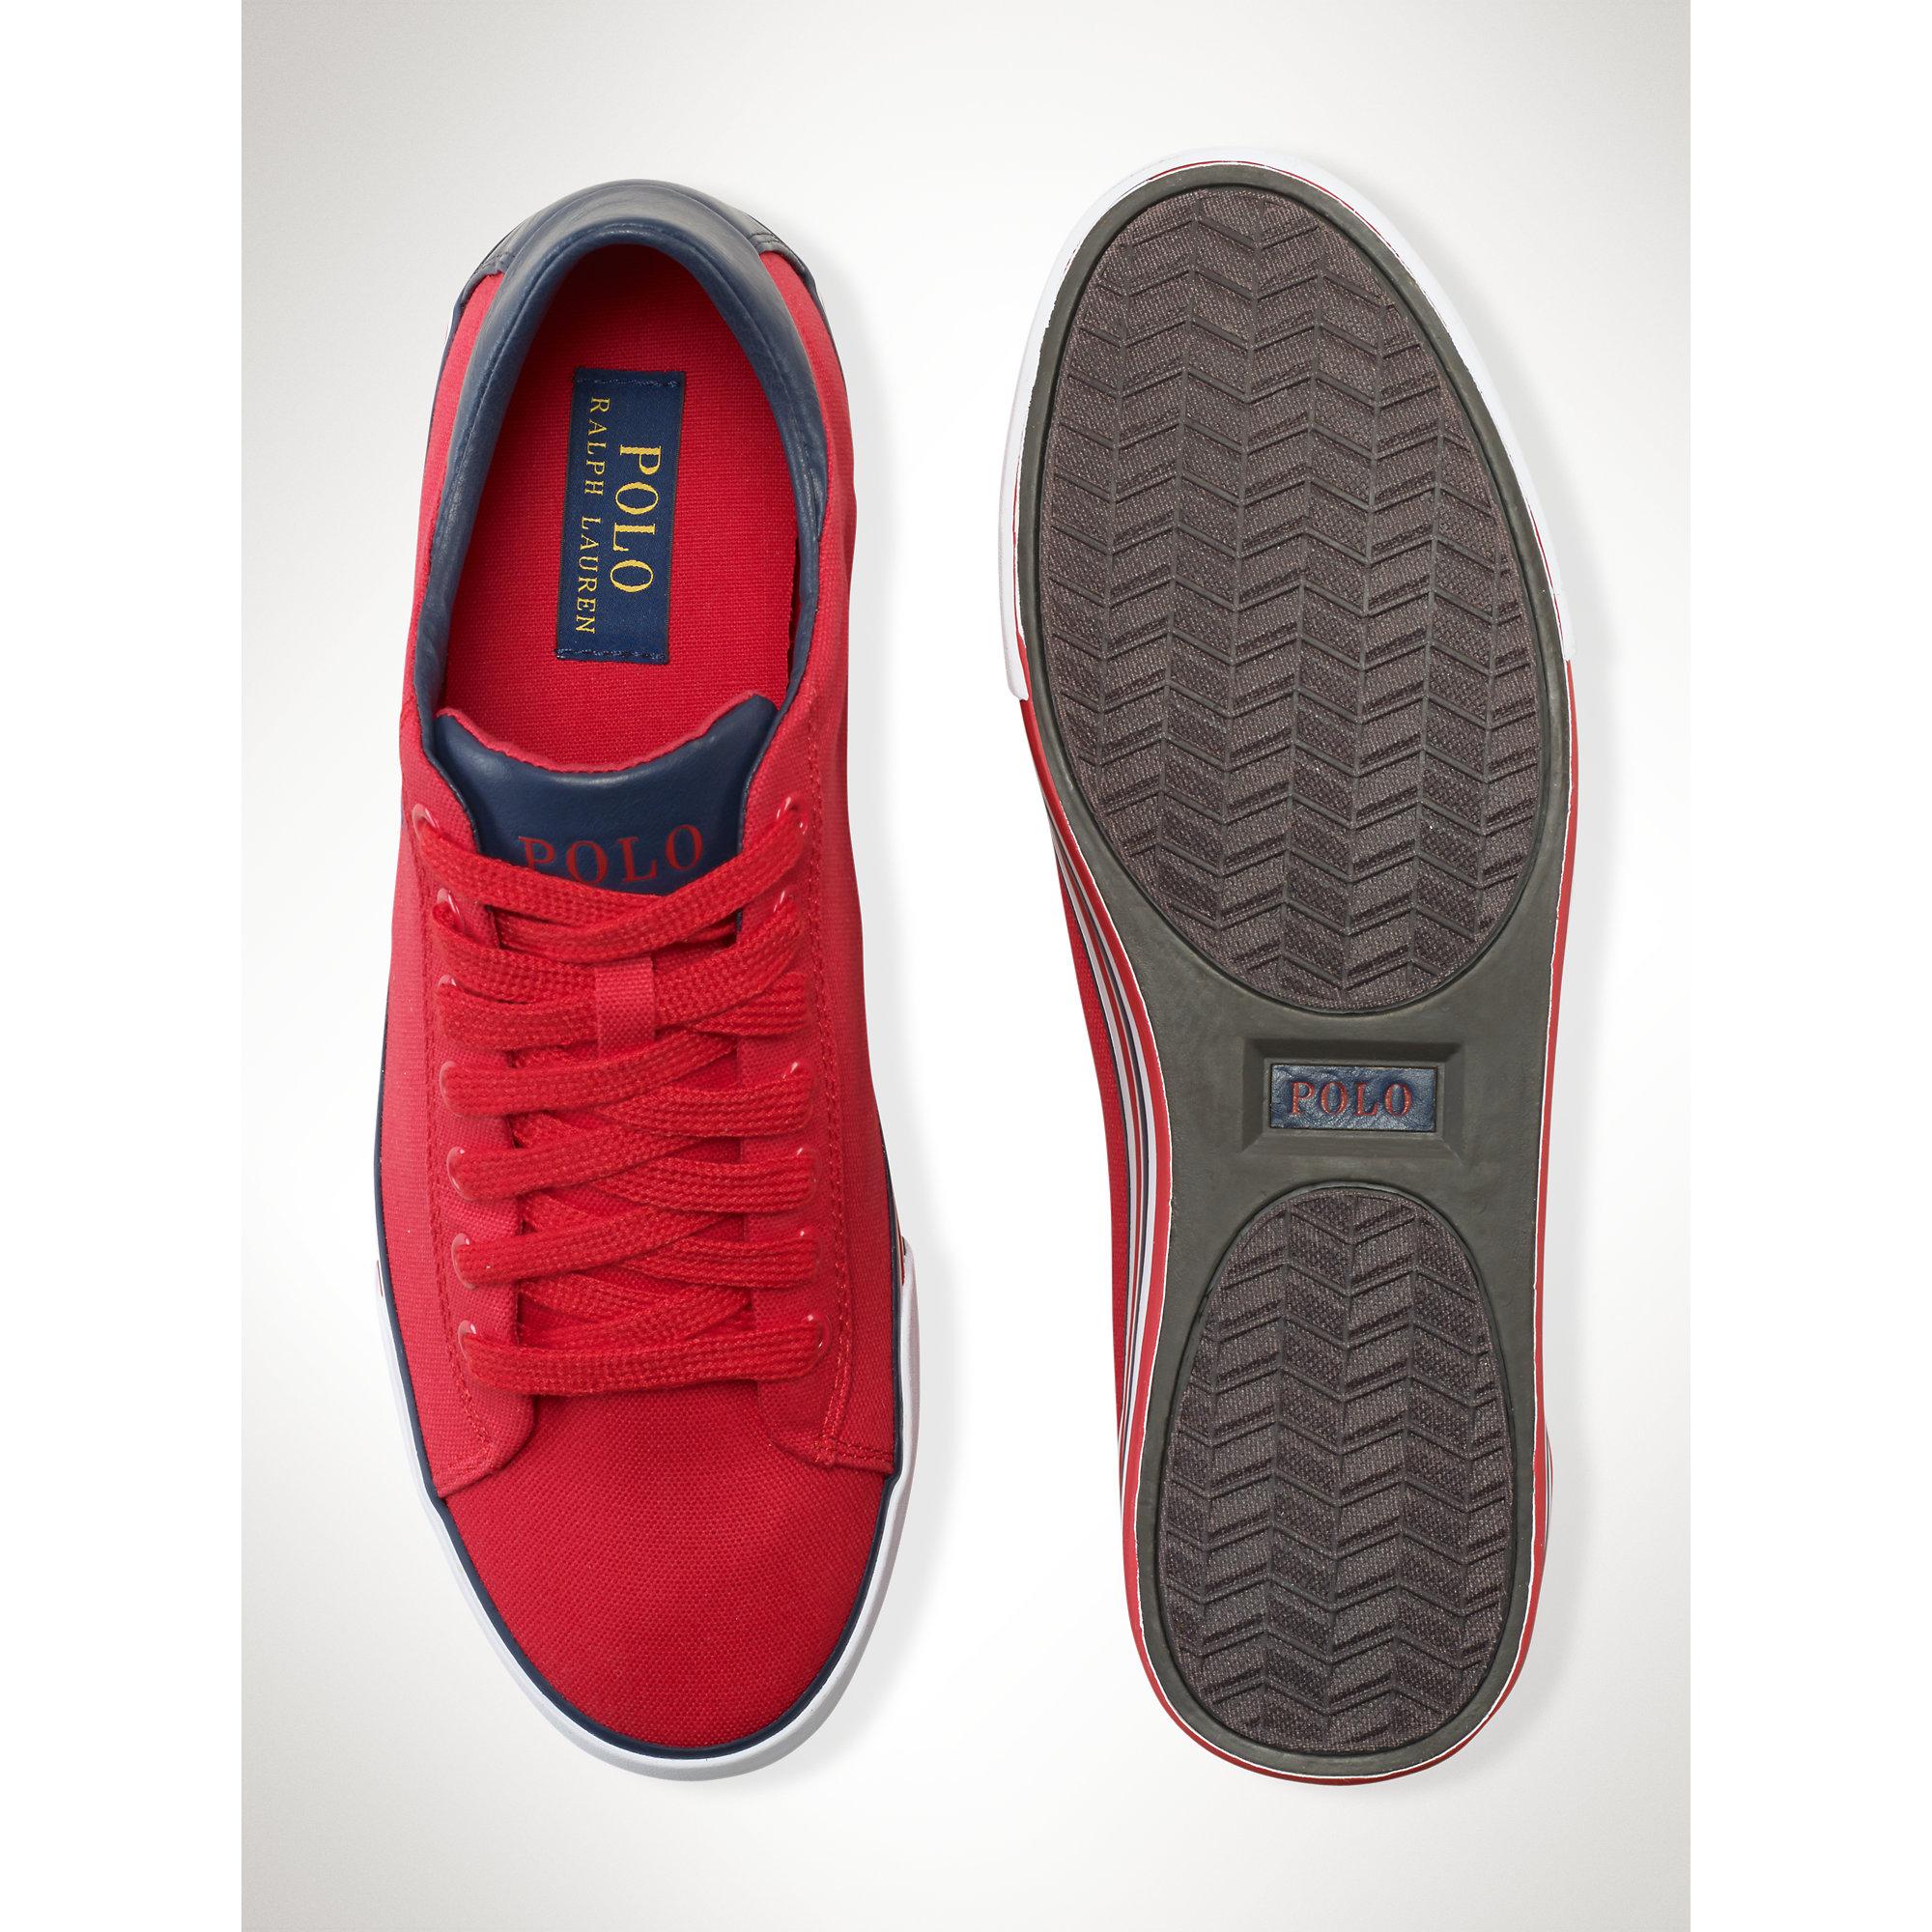 825160d8b56c Lyst - Polo Ralph Lauren Canvas Harvey Sneaker in Red for Men